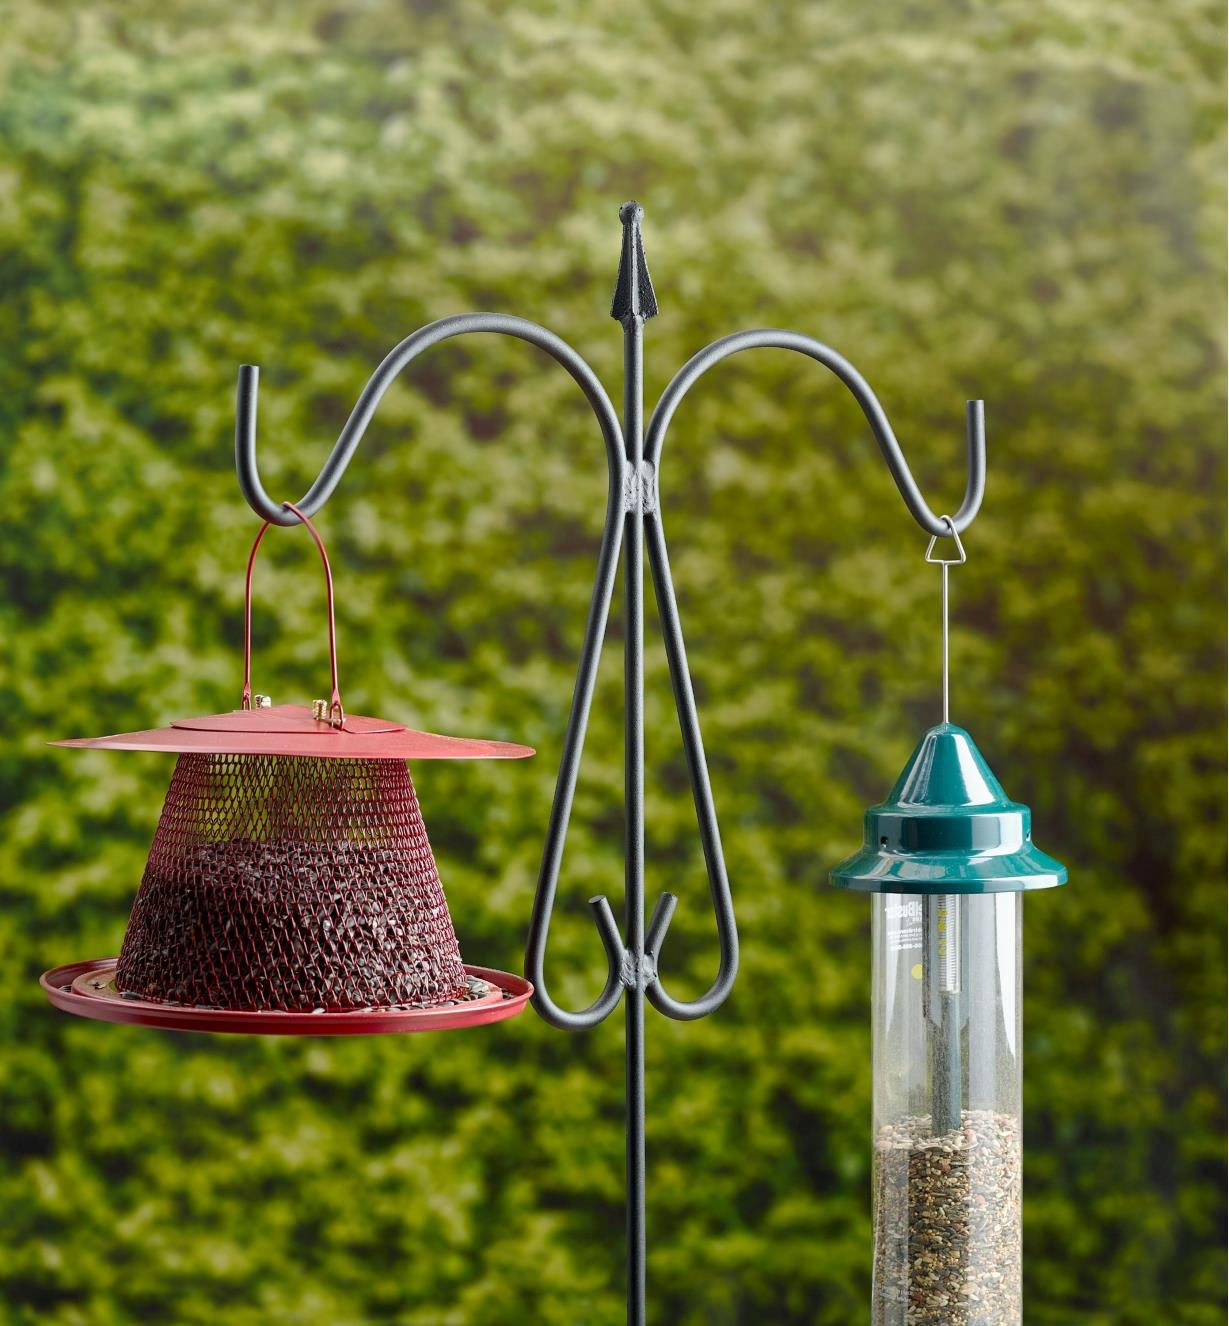 Two bird feeders hung from a double garden hanger